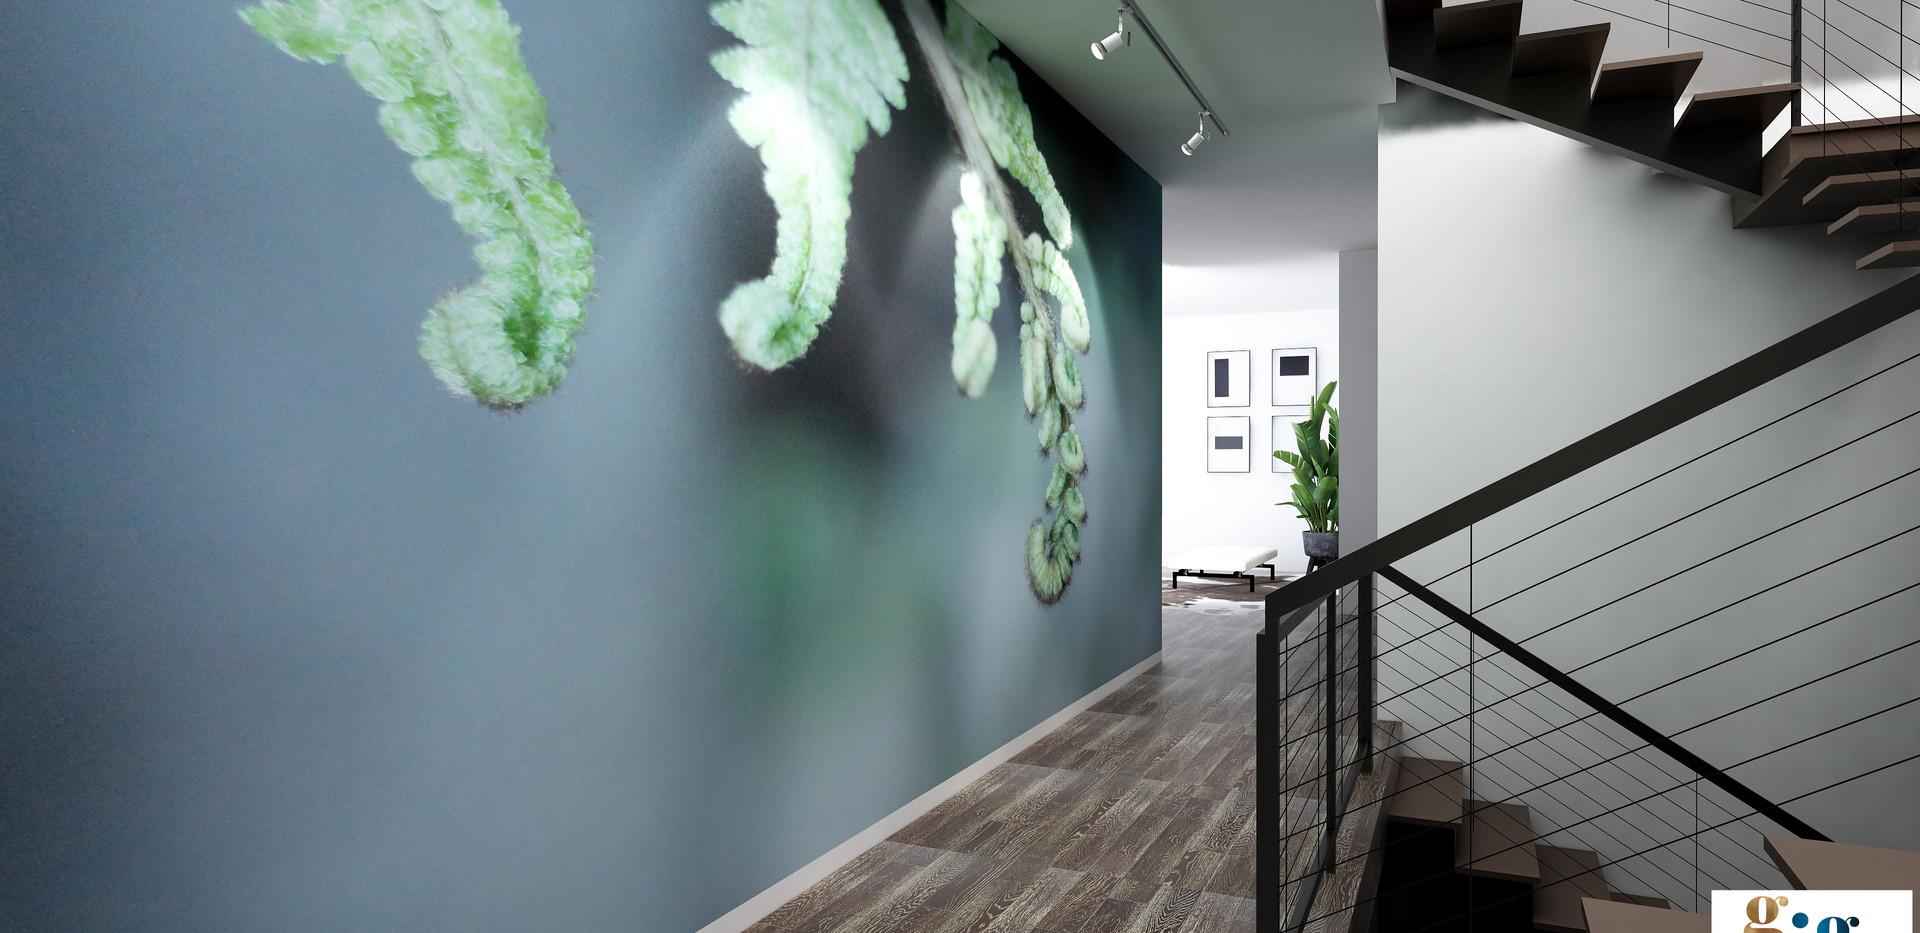 Hallway render with mural